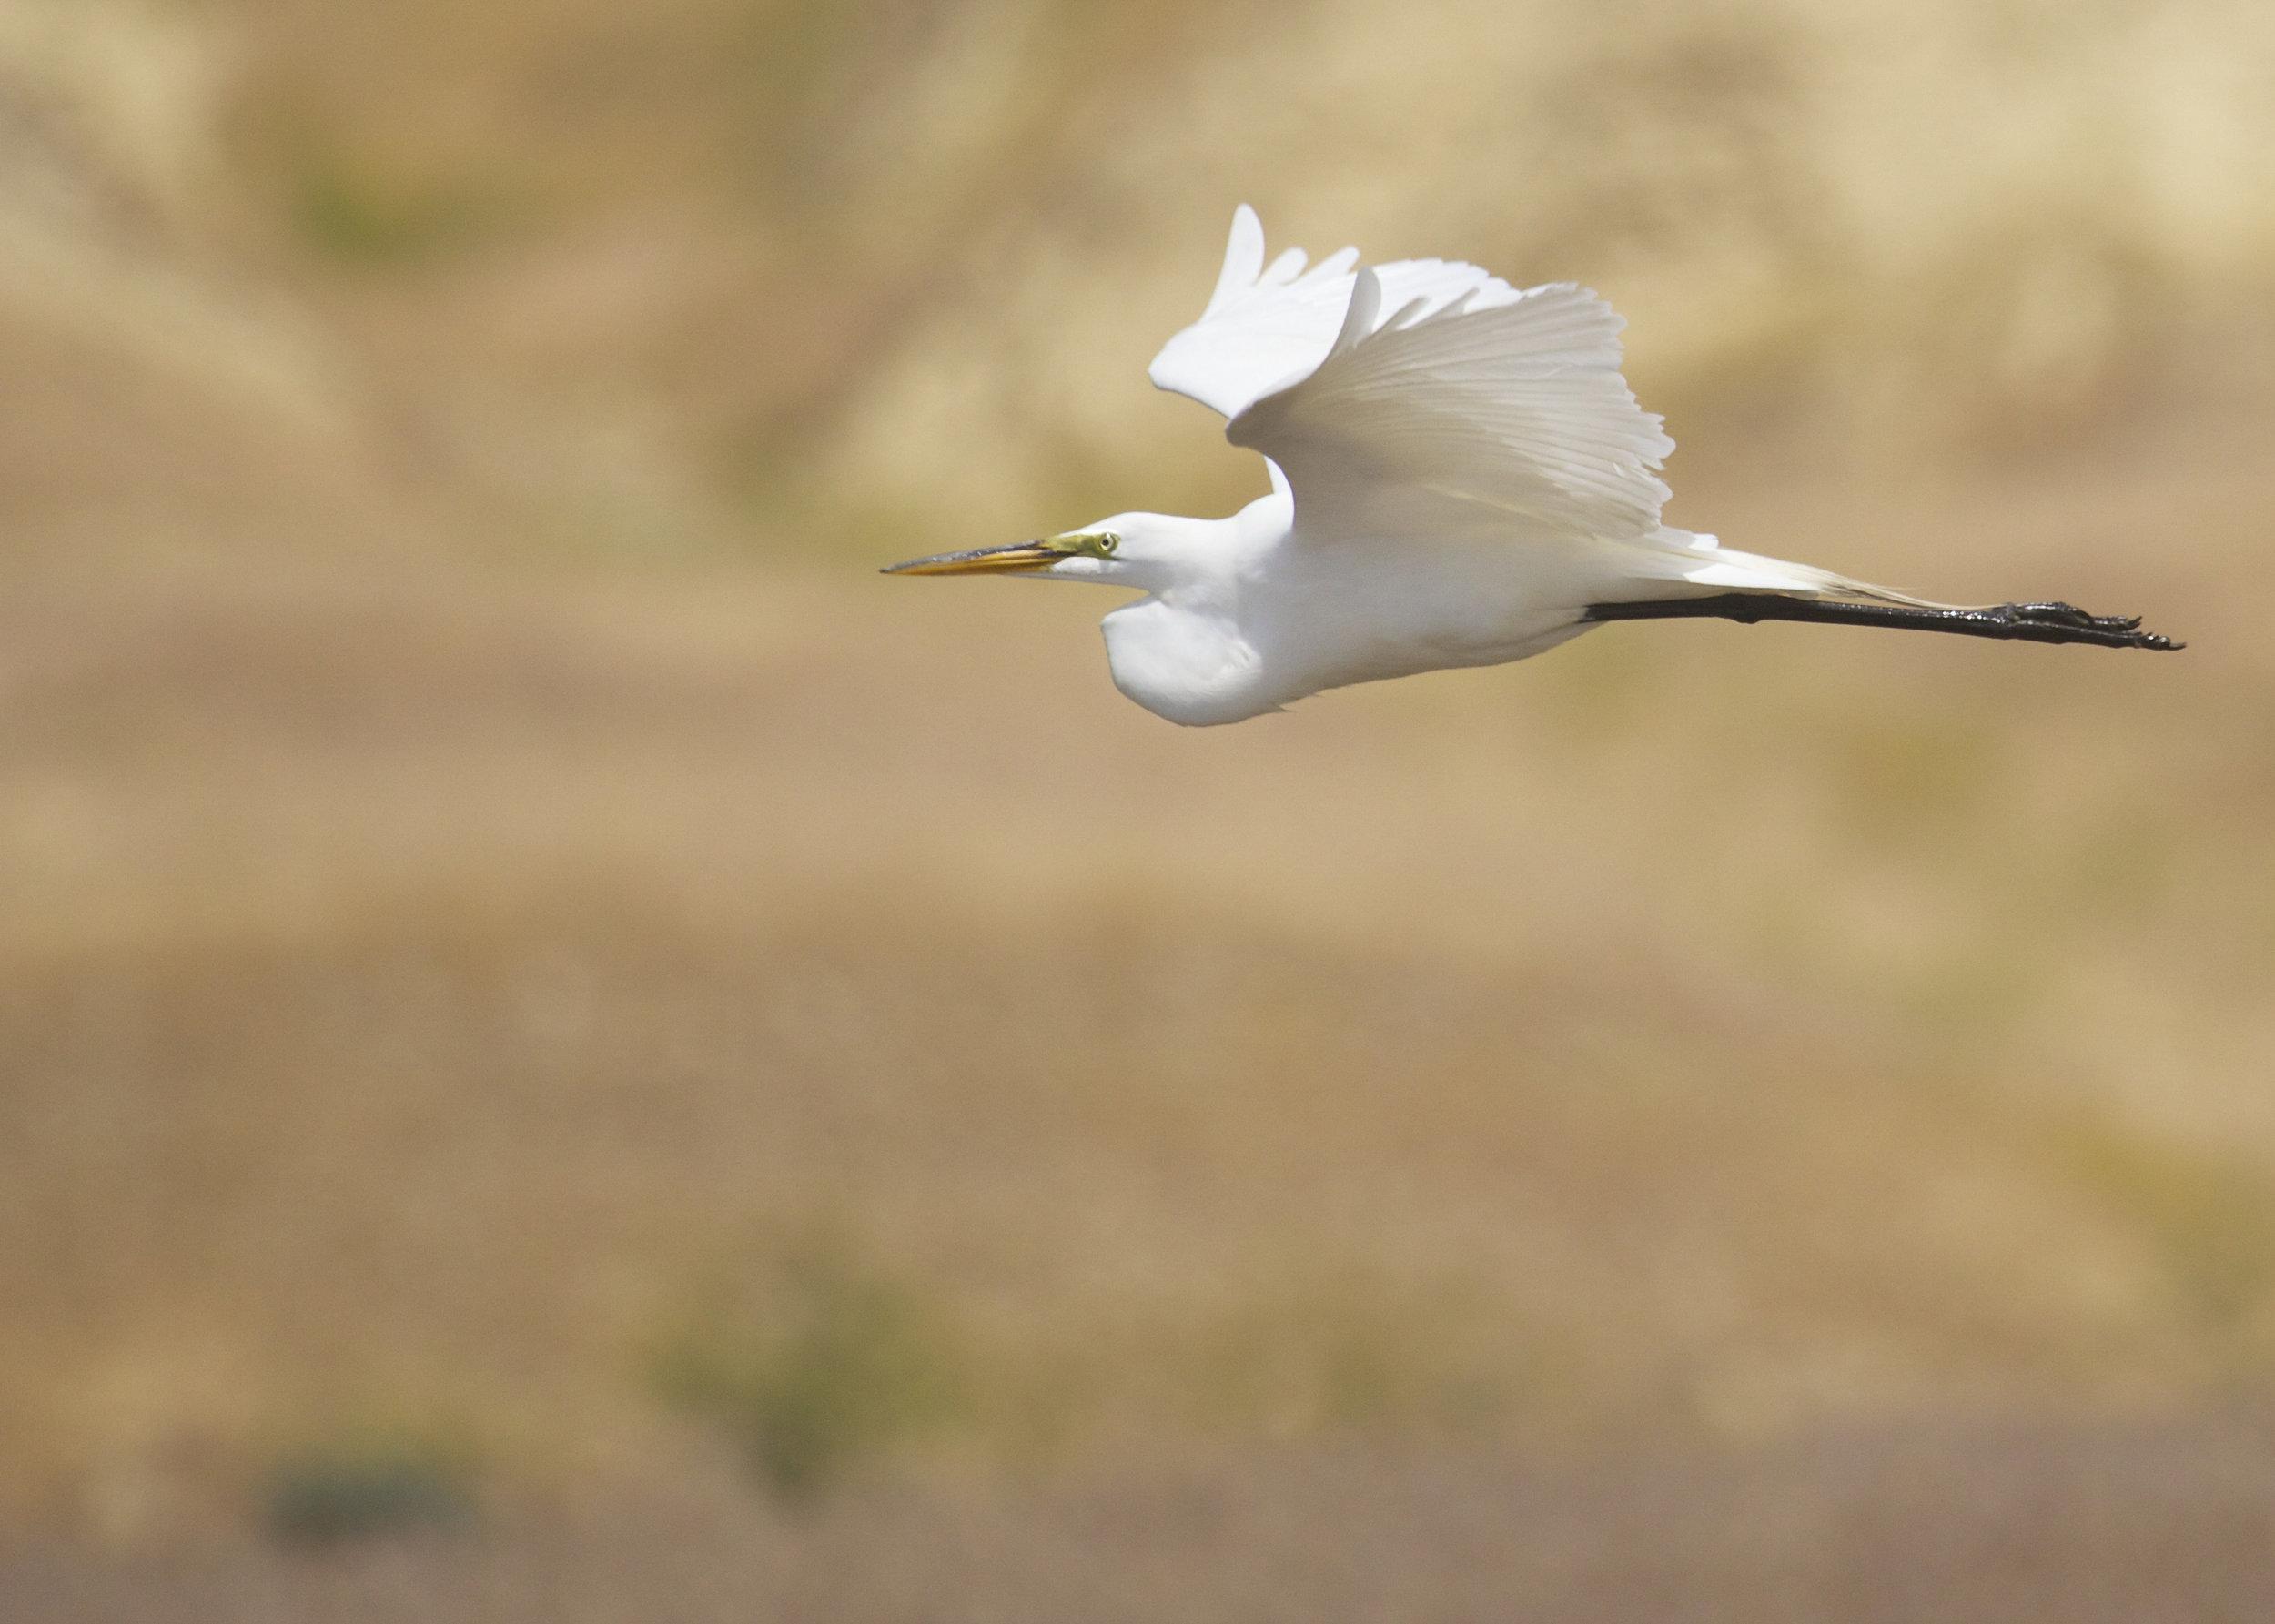 A Great egret (Ardea alba) flies through the Hanford Reach National Monument. Photo by Michael Deckert.